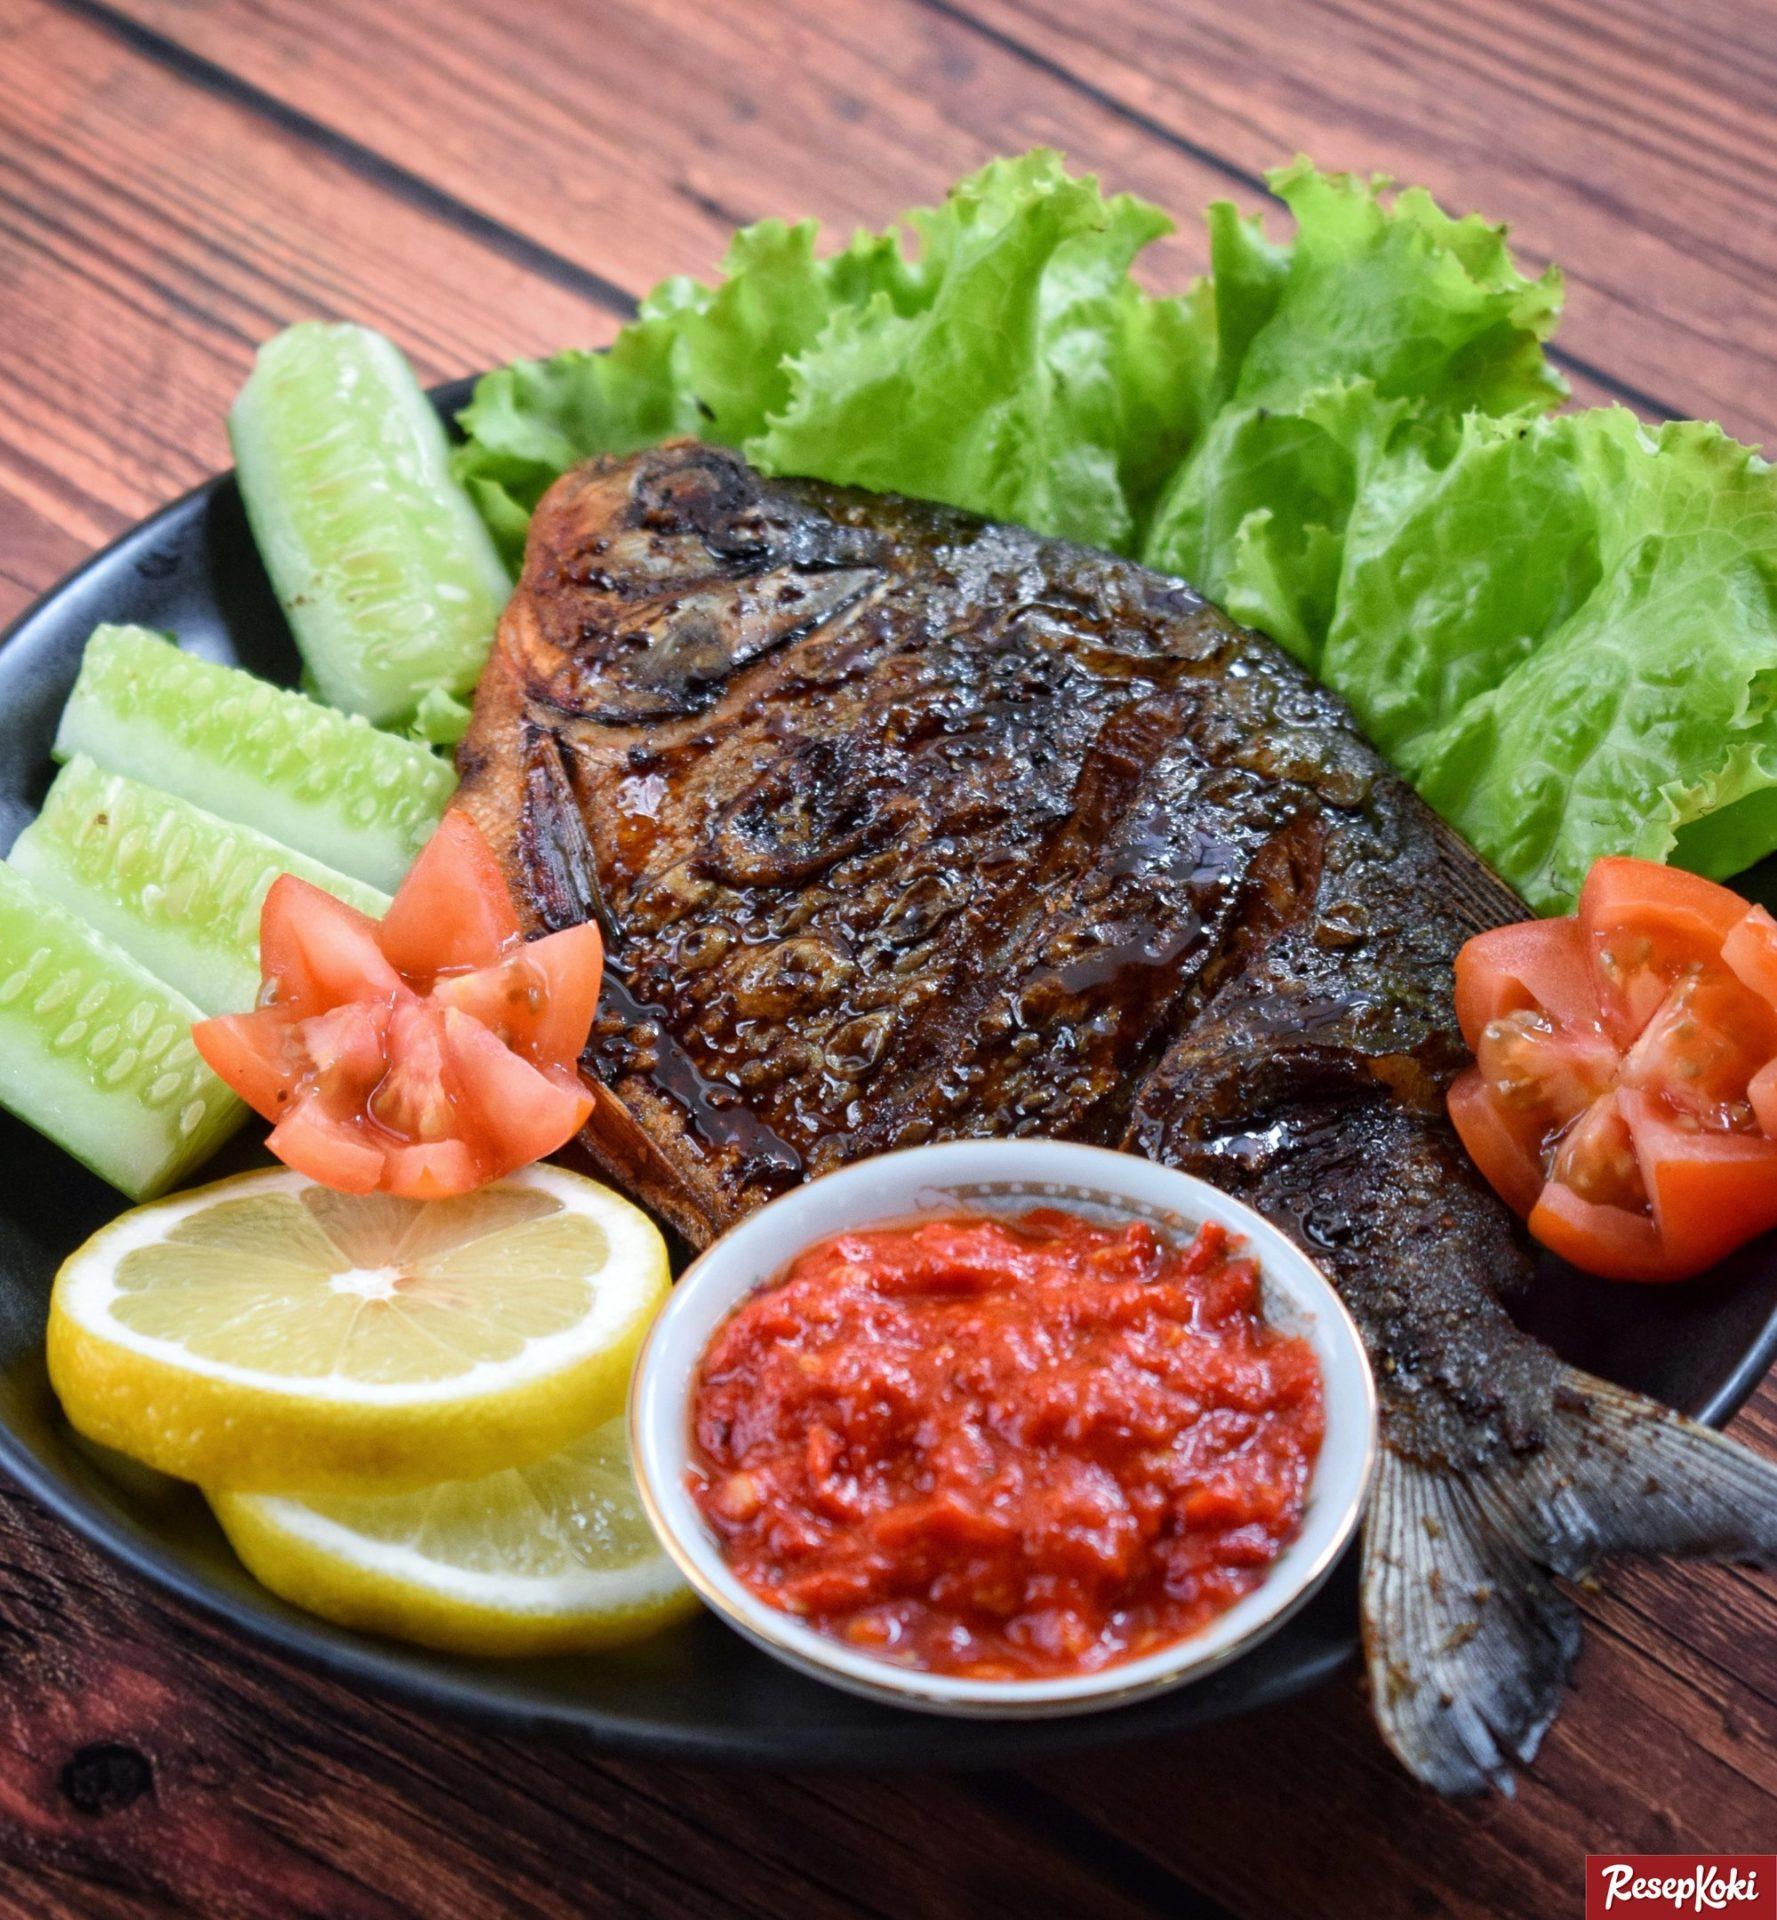 Ikan Bawal Bakar Enak Praktis Bebas Amis - Resep | ResepKoki